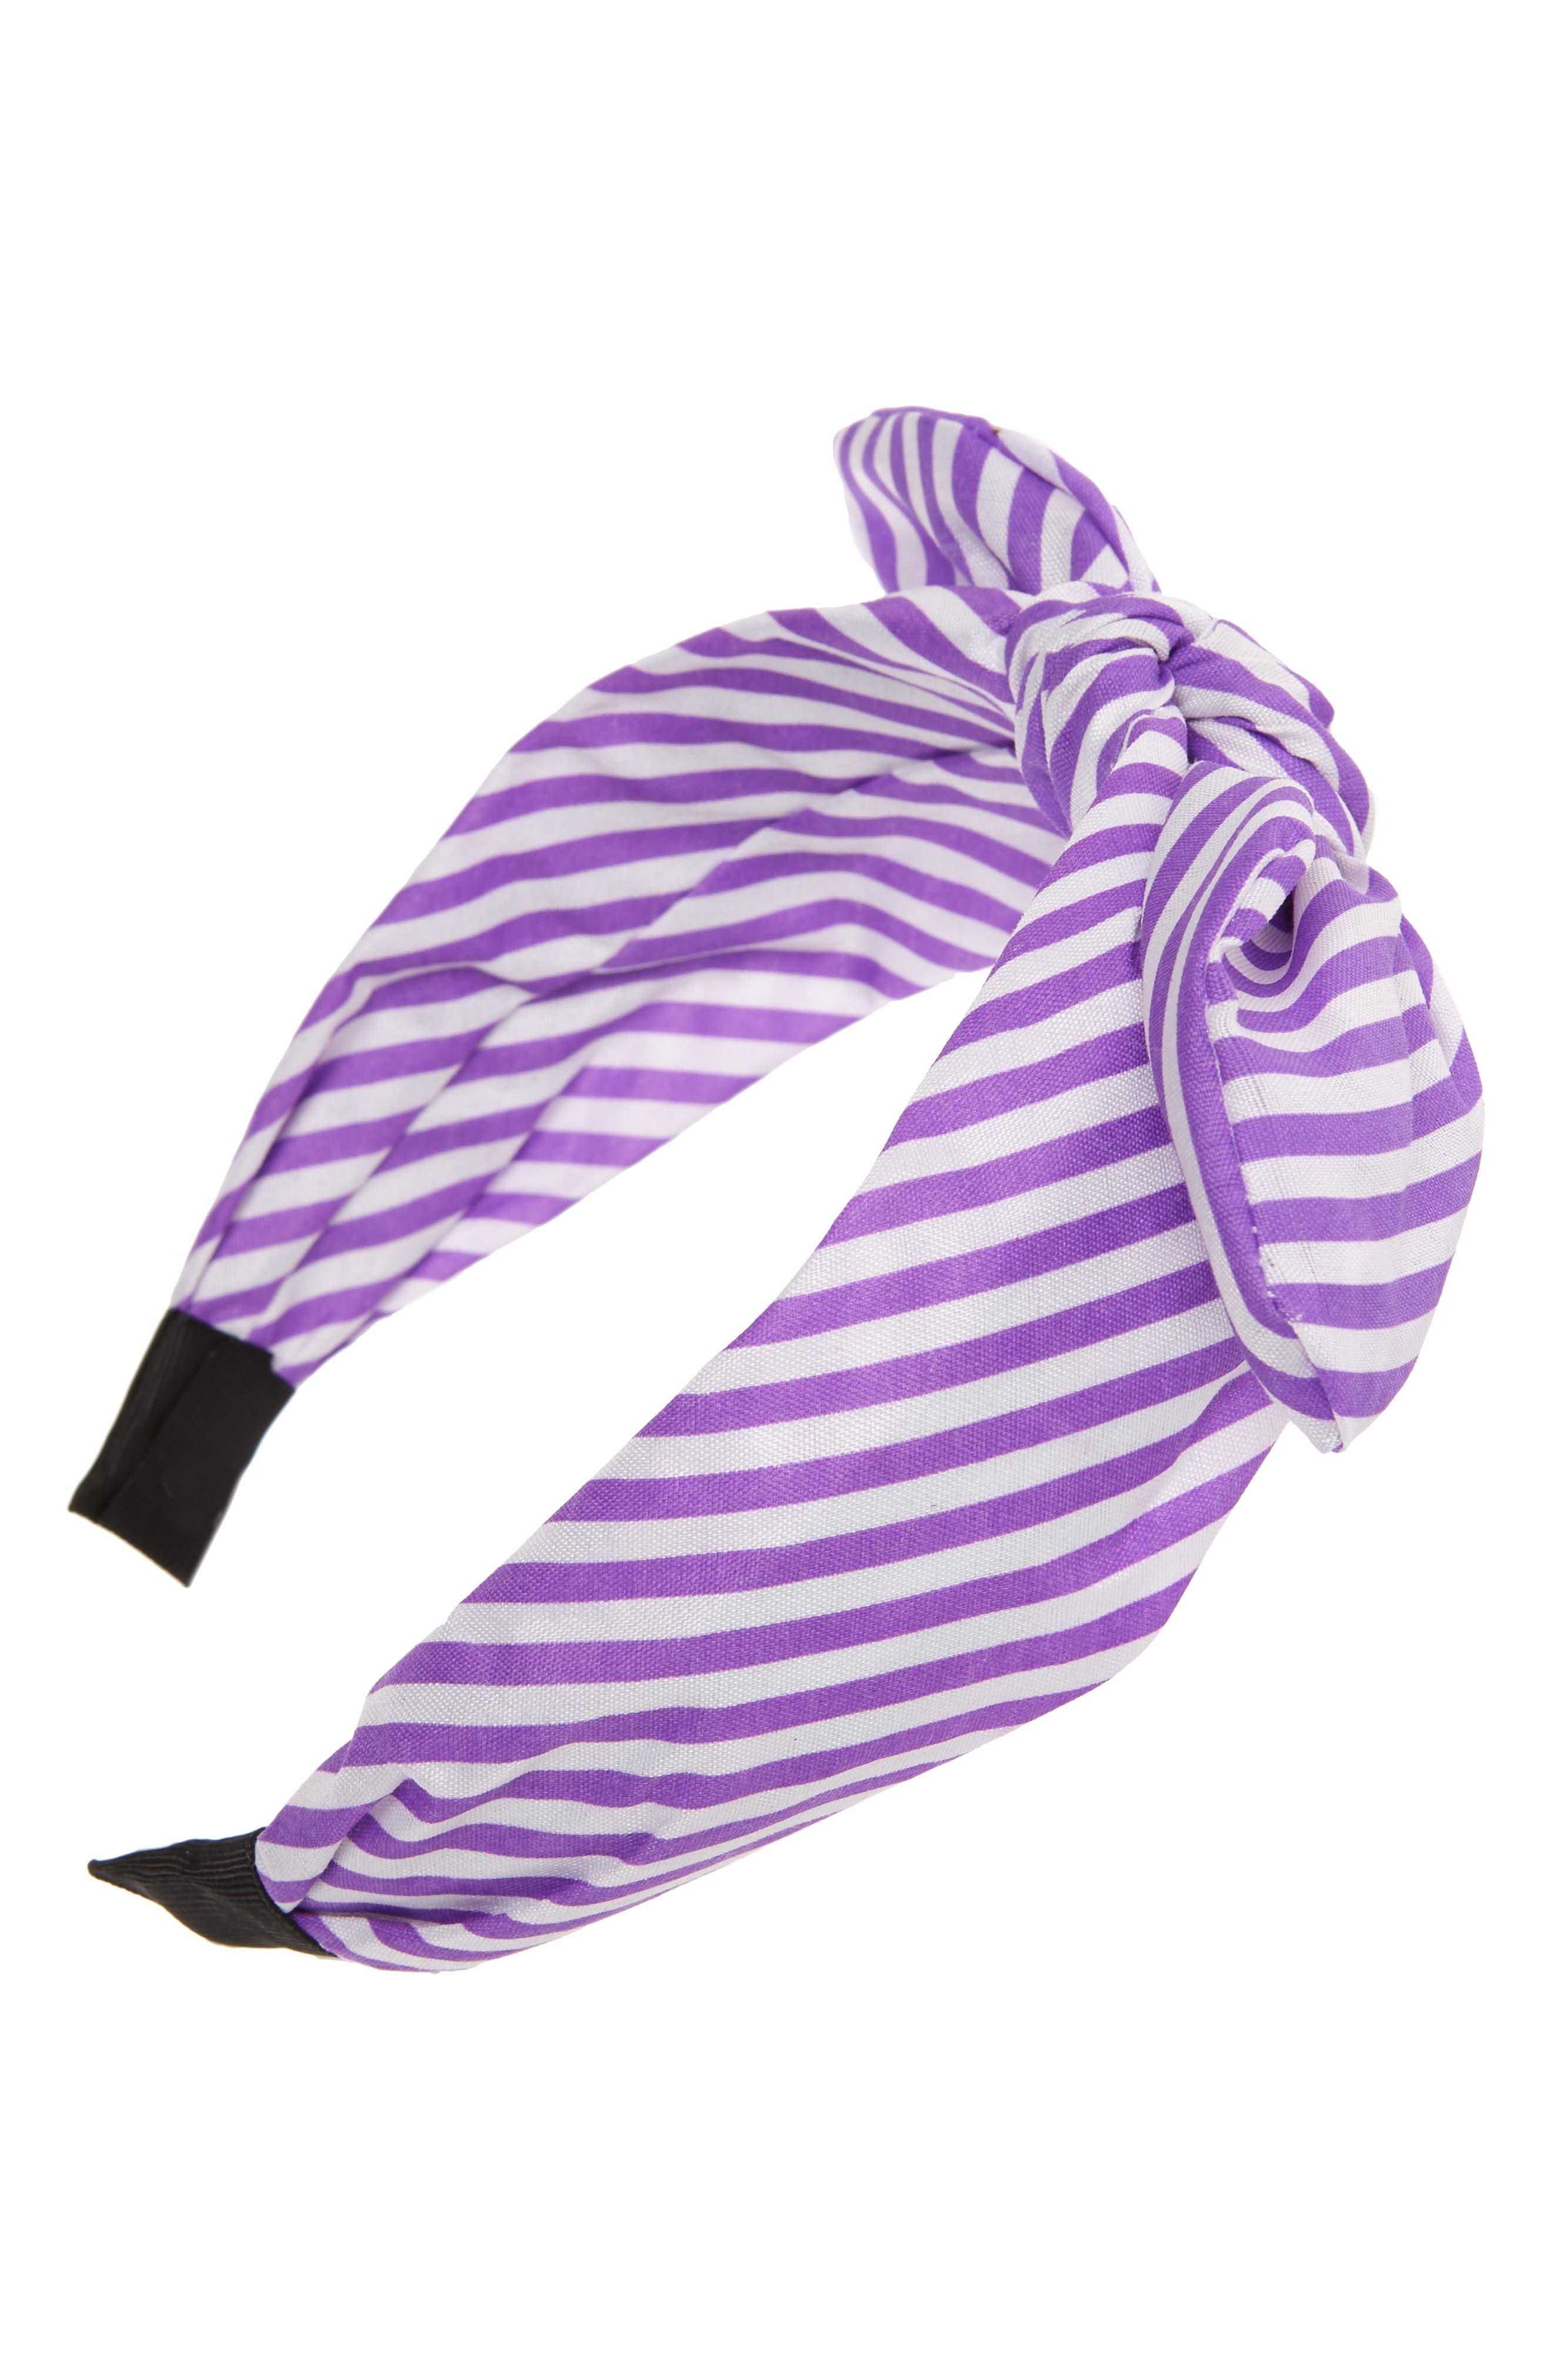 TASHA, Knotted Stripe Bow Headband, Main thumbnail 1, color, LAVENDER/ WHITE